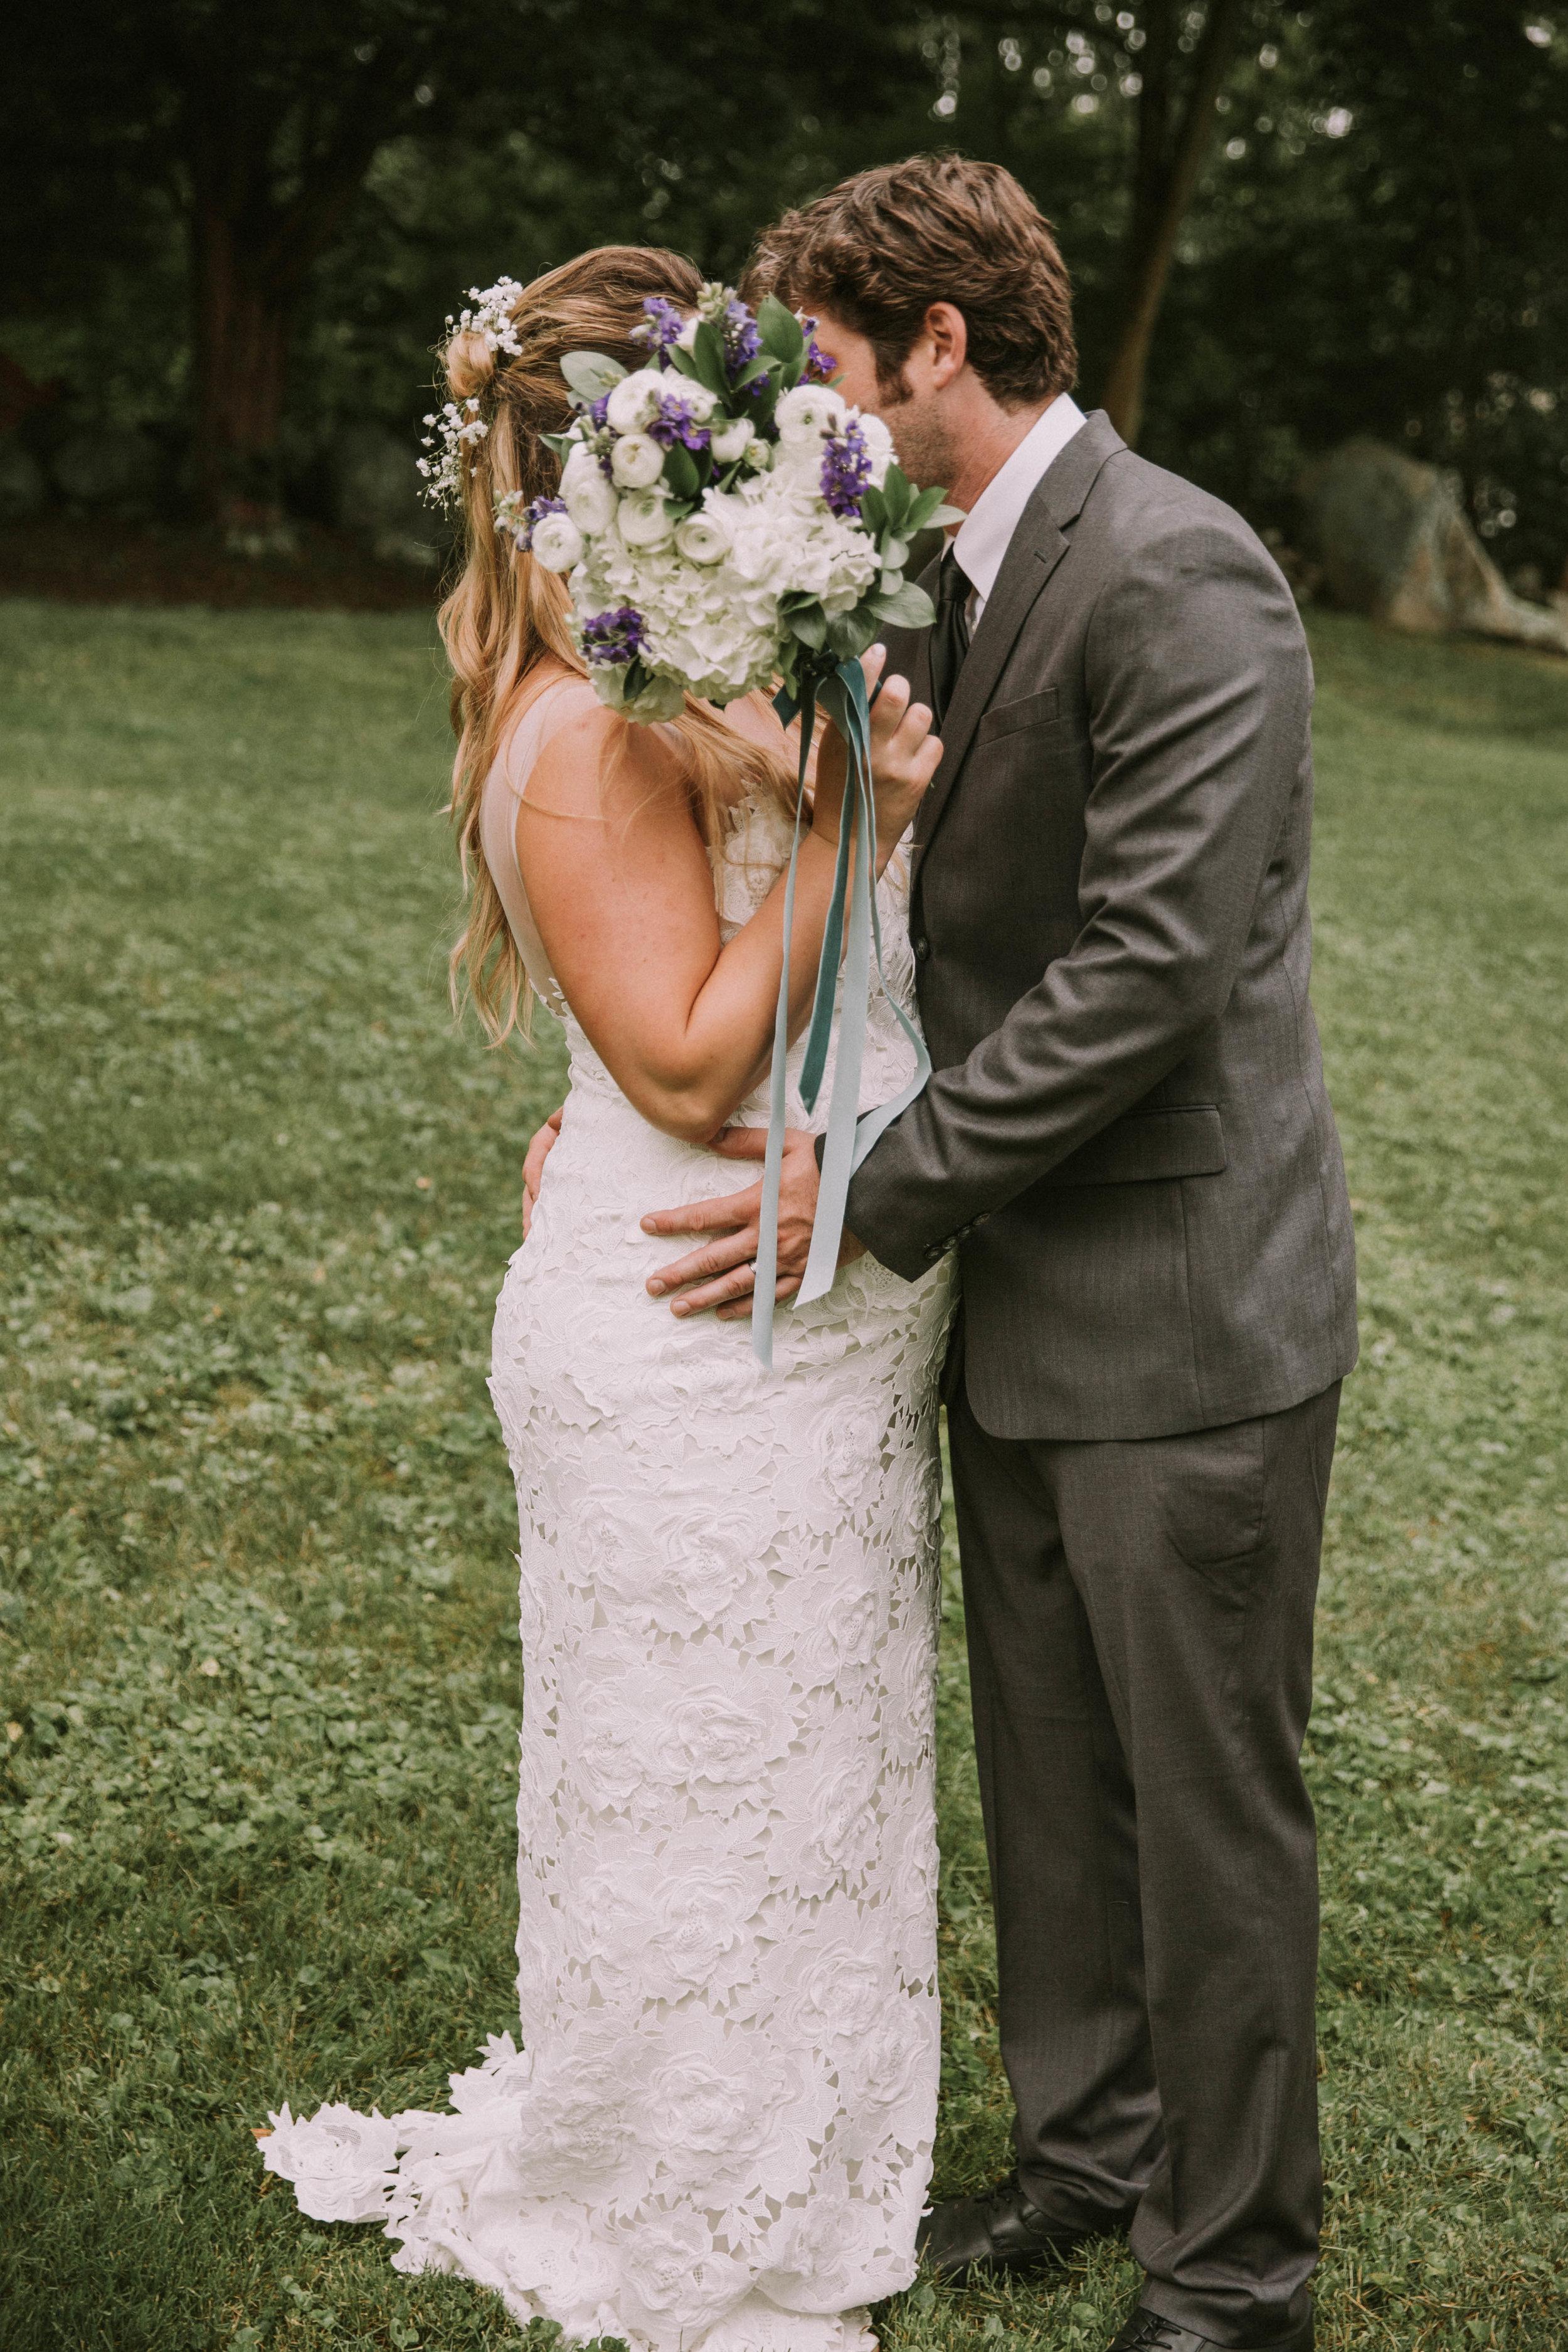 spitale-elopement-blog-14-of-18.jpg